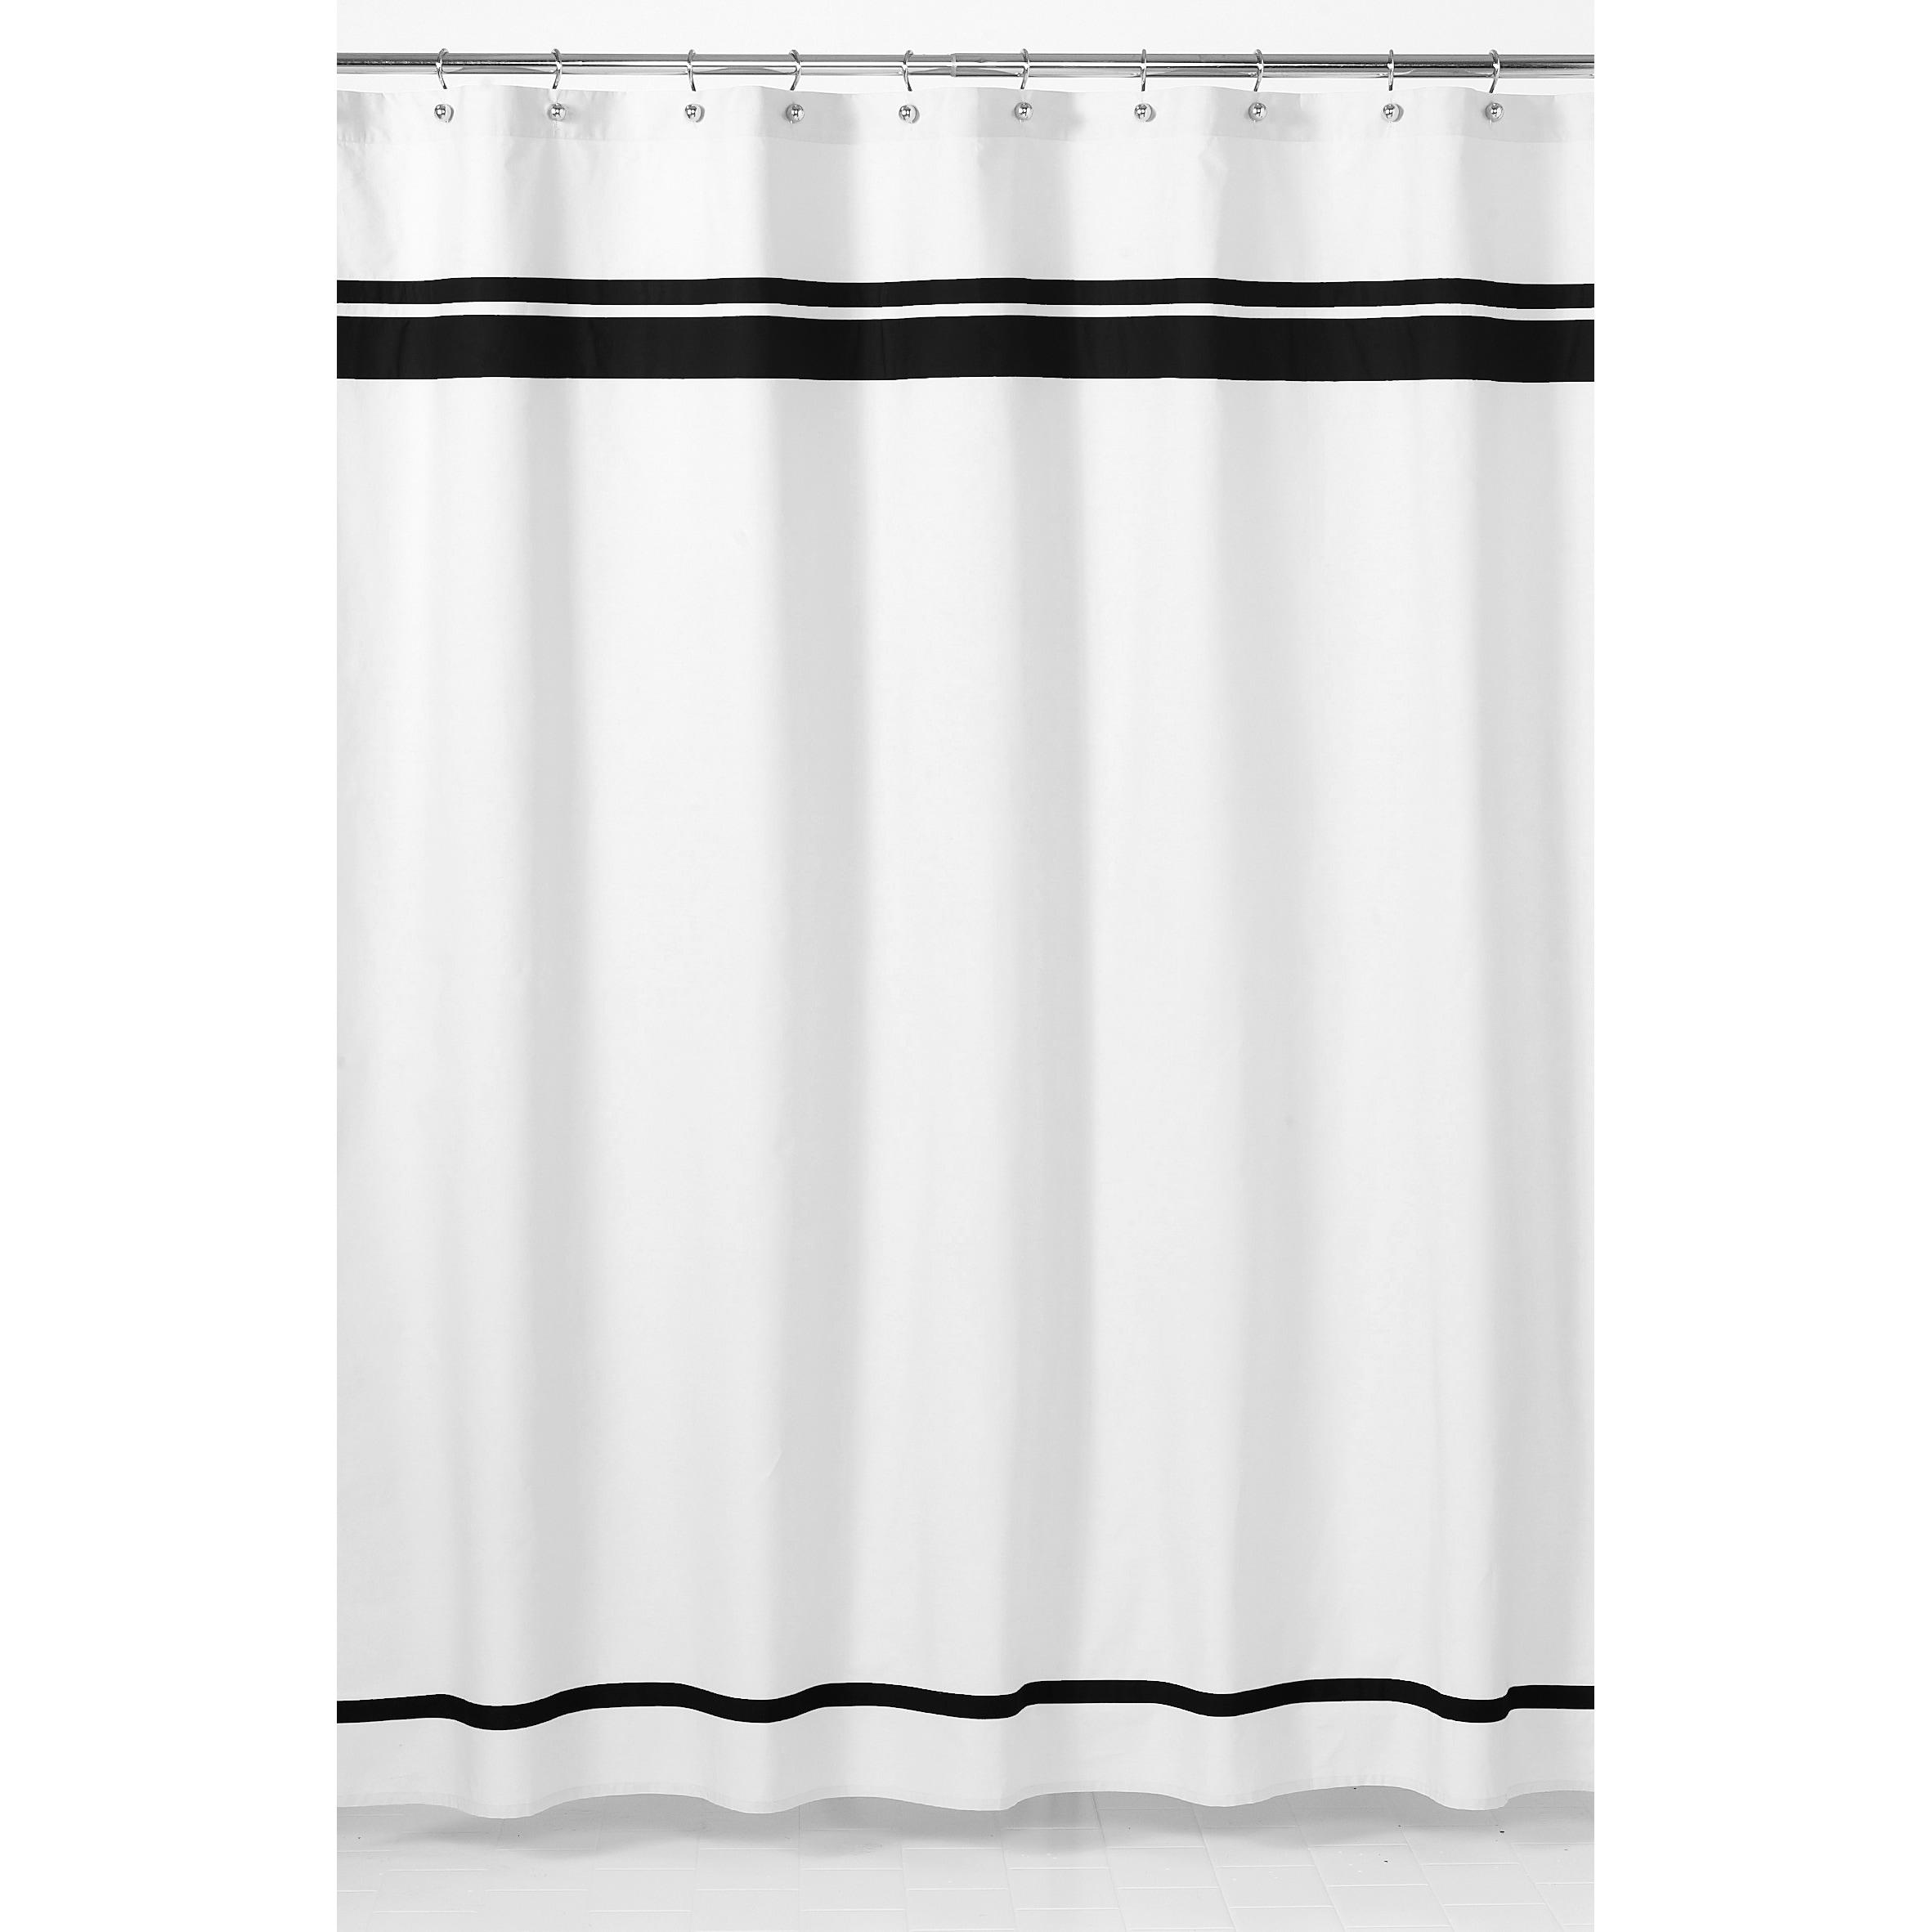 Shop Sweet Jojo Designs White And Black Hotel Shower Curtain